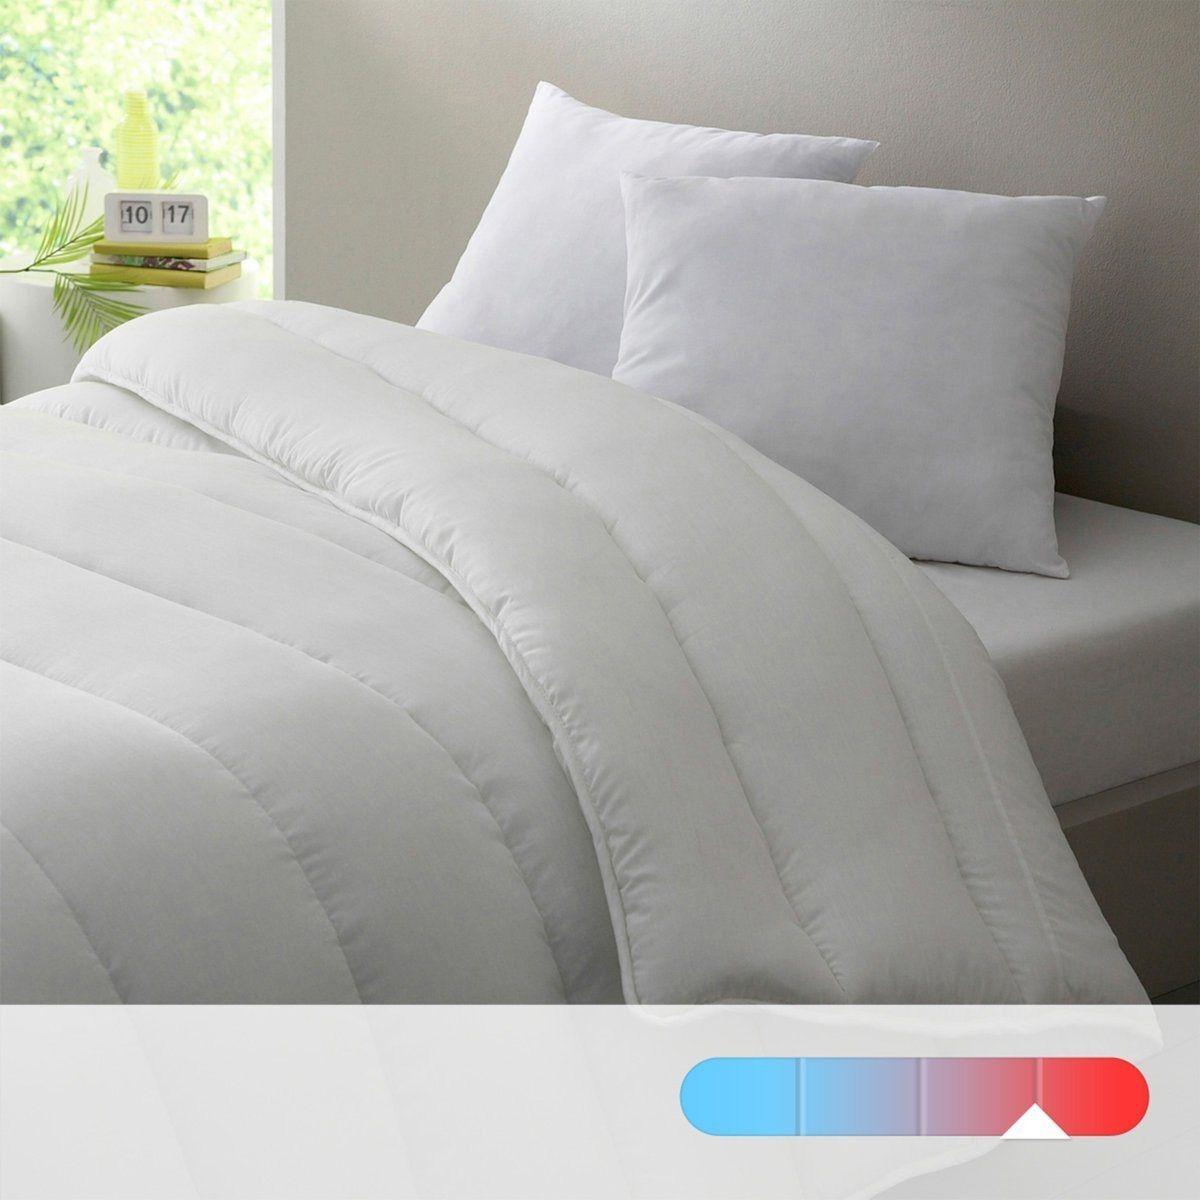 Couette 500 g/m², 100% polyester traitée SANITIZED